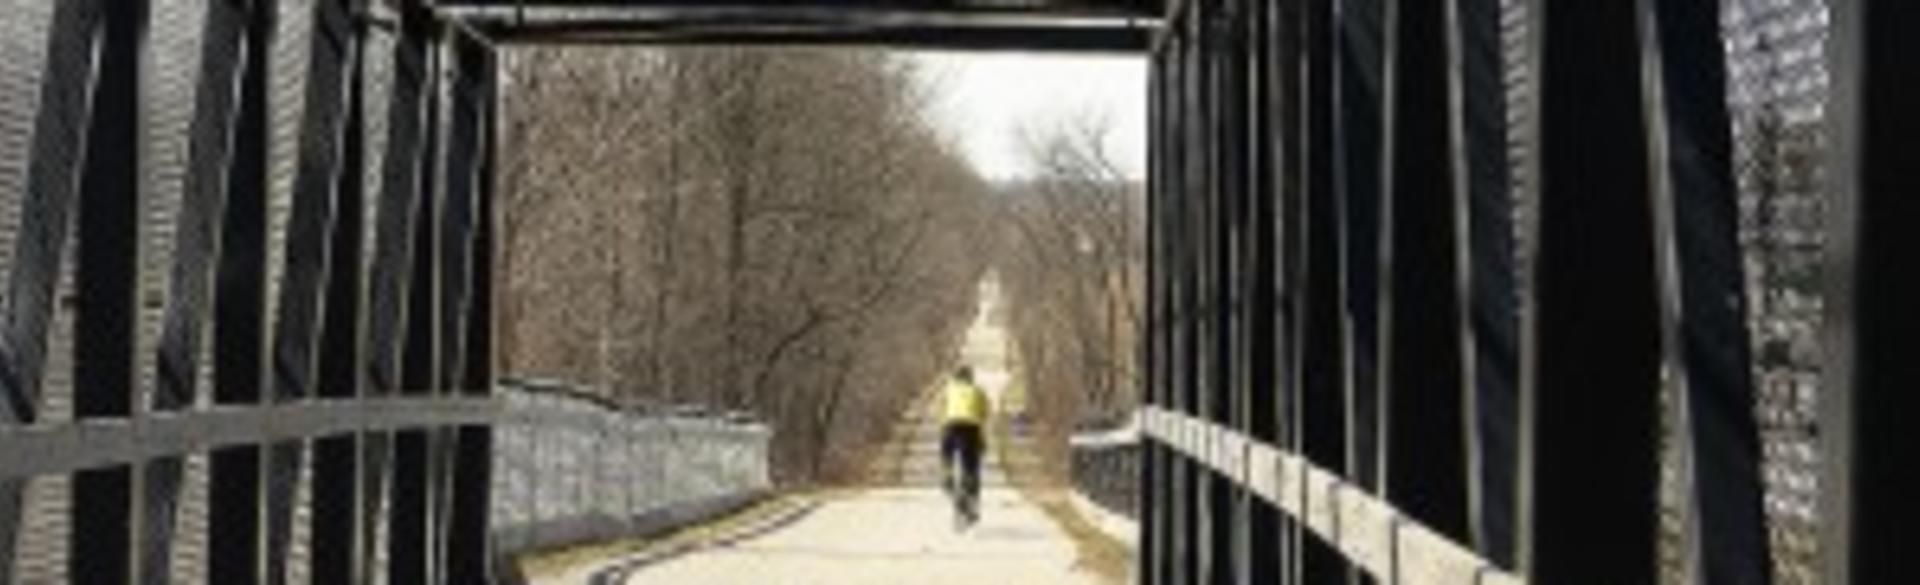 Bicyclist Crossing Bridge